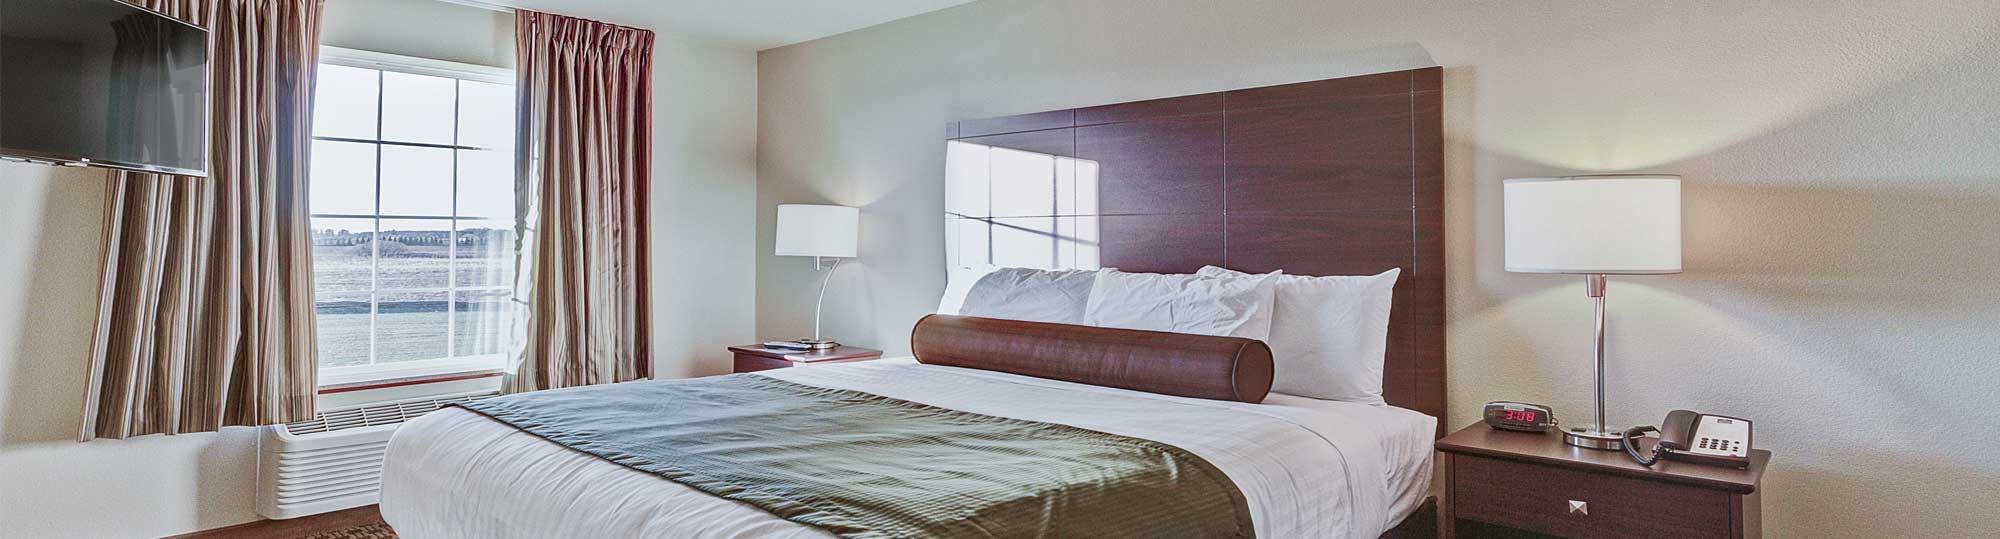 Cobblestone Hotel and Suites Pulaski